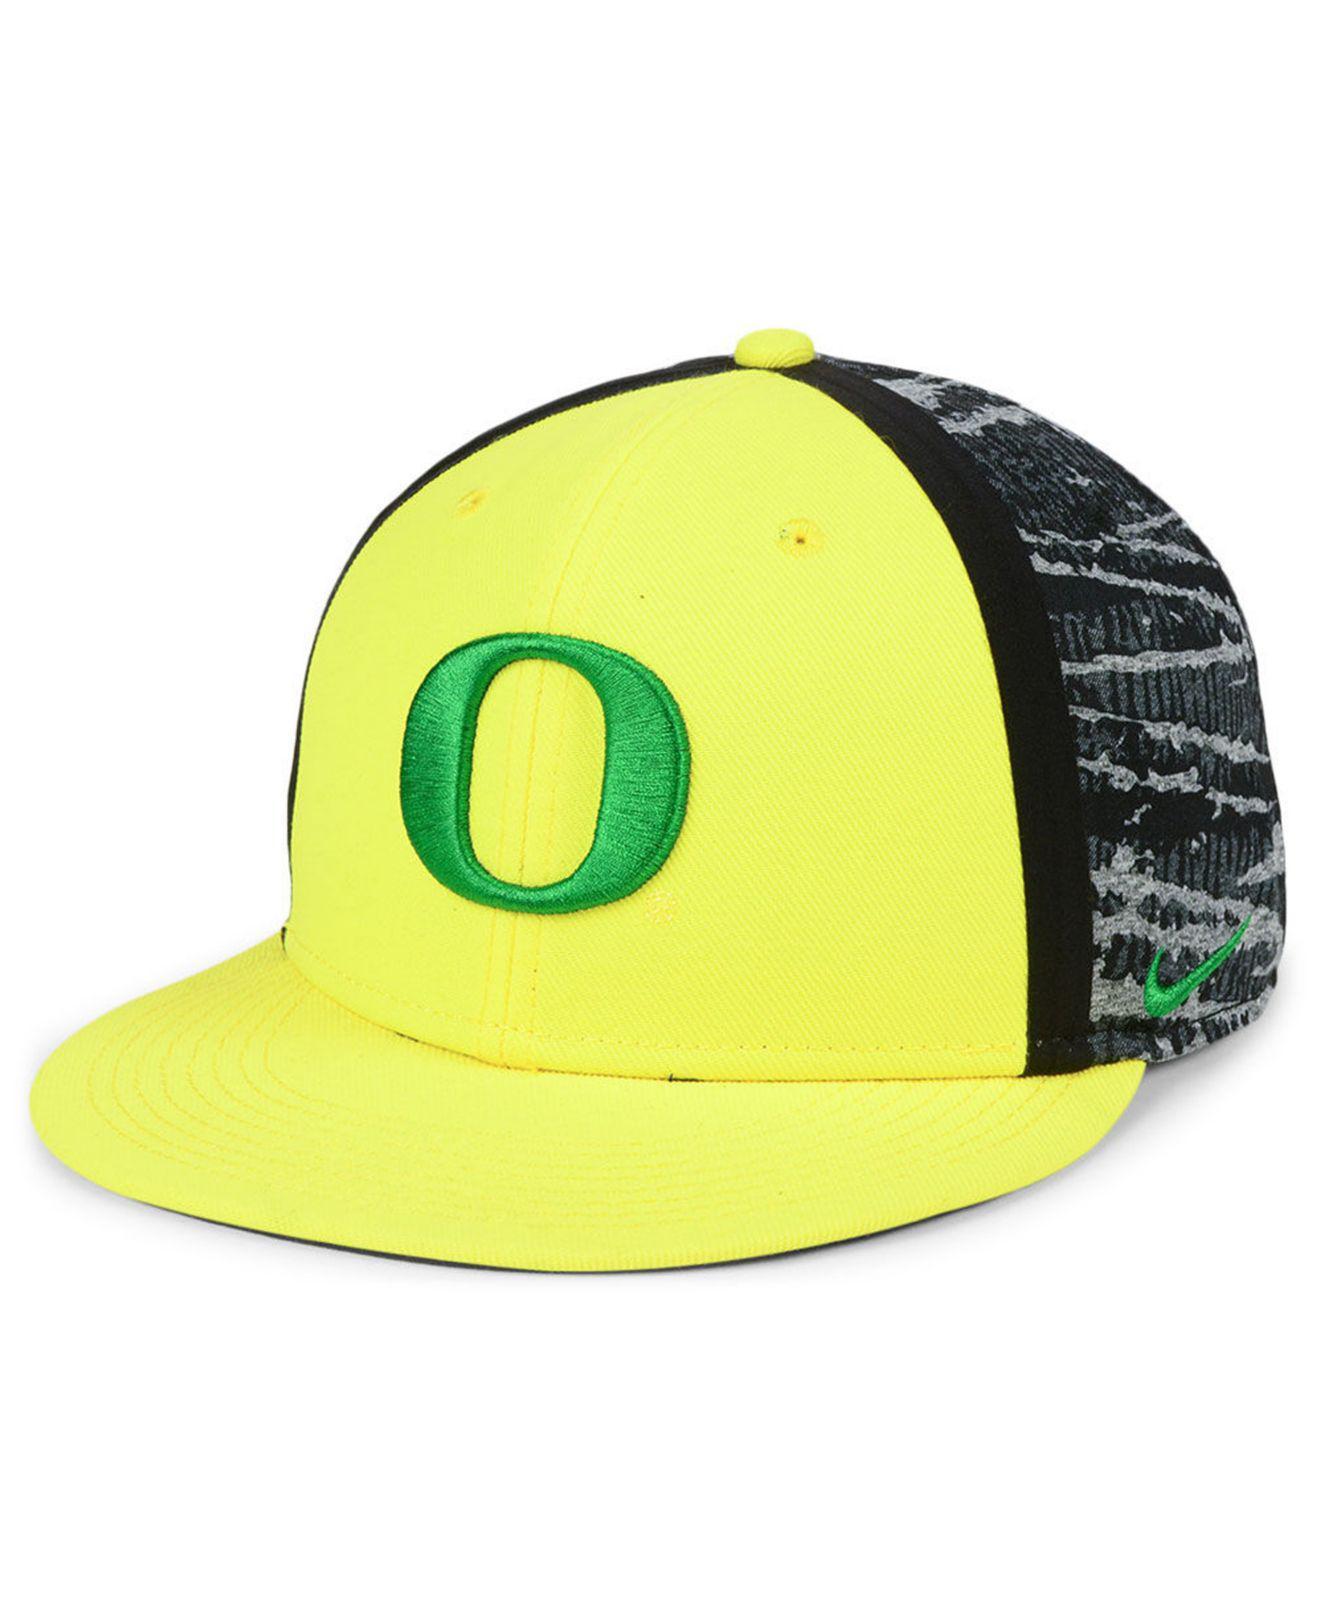 2096021cab5 Lyst - Nike Oregon Ducks Dna True Snapback Cap in Yellow for Men